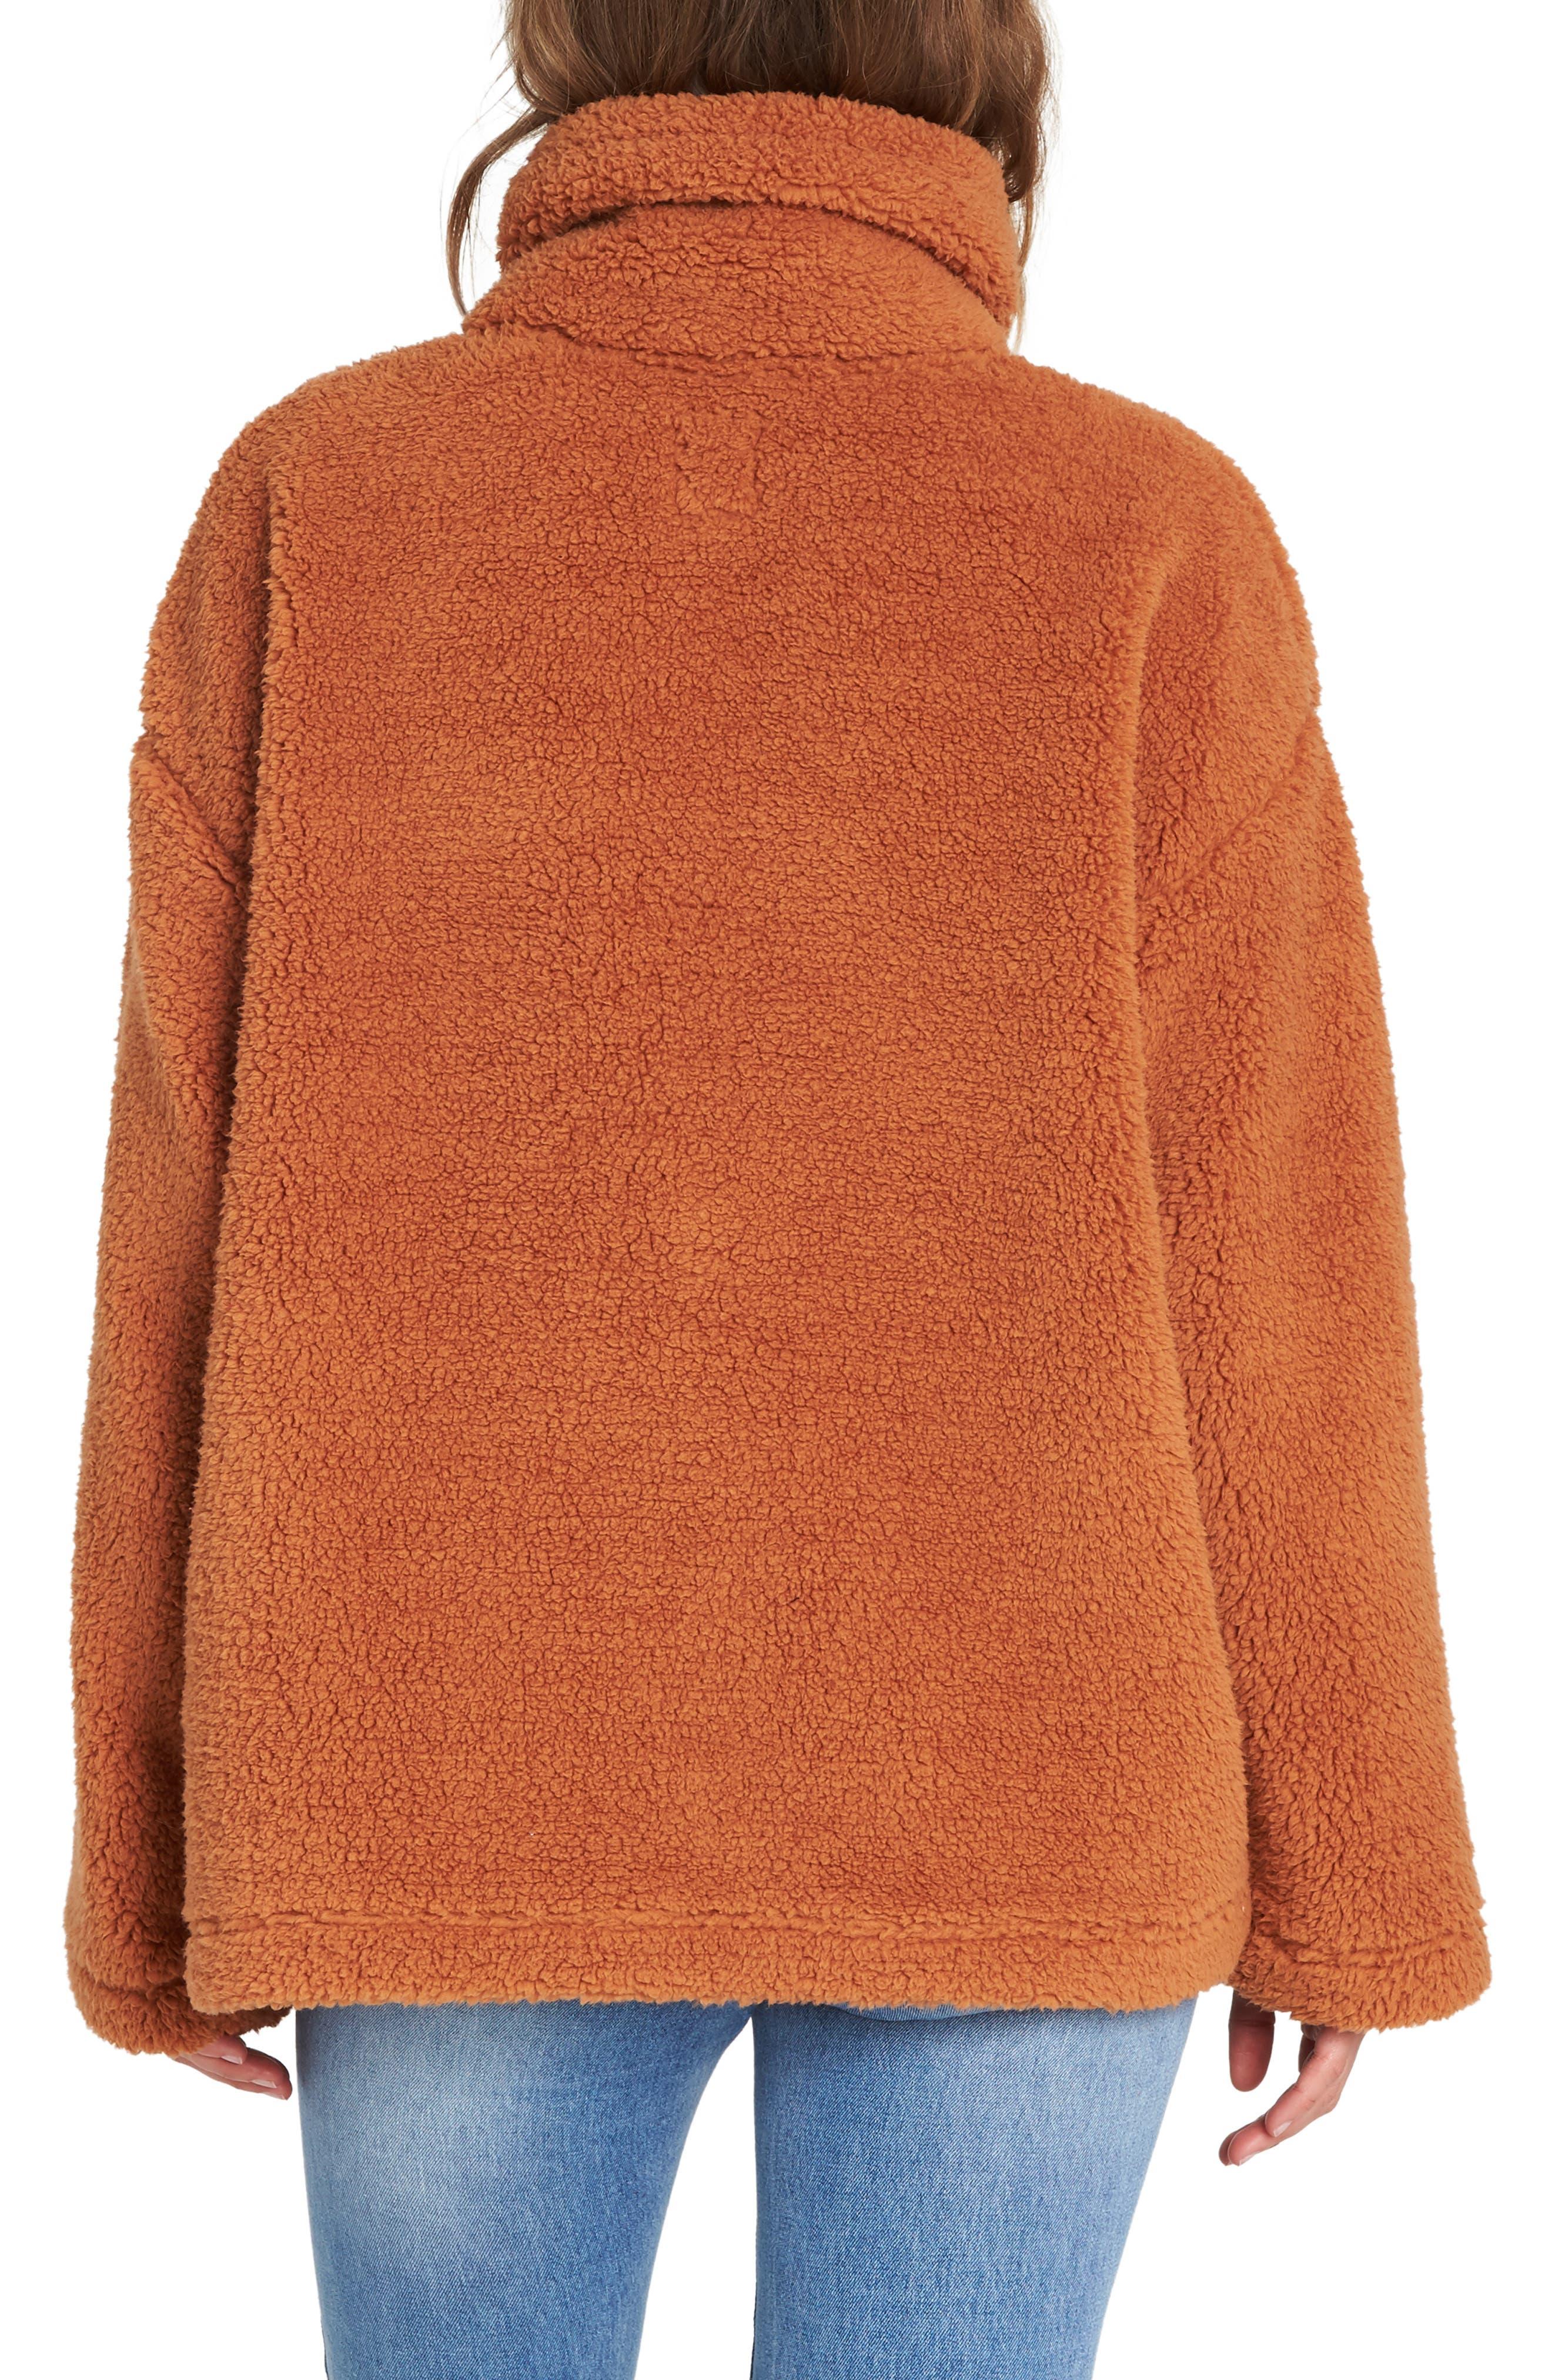 BILLABONG, Cozy Days Faux Fur Jacket, Alternate thumbnail 2, color, TOFFEE